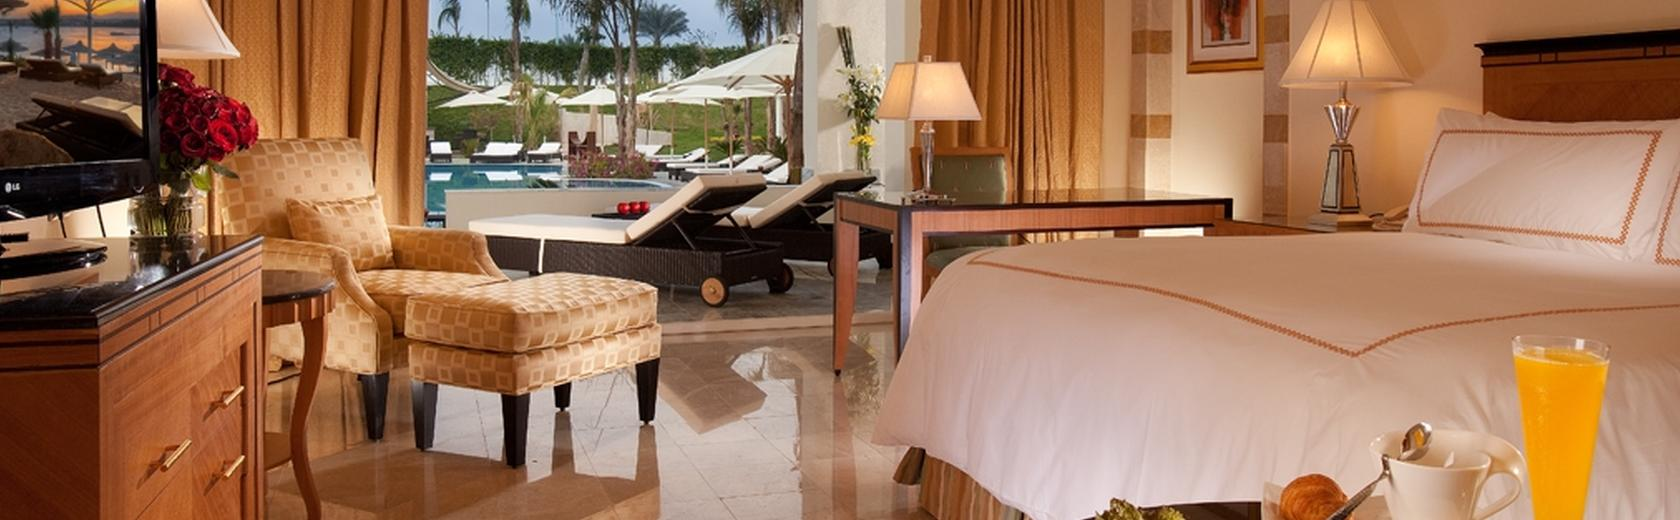 Le Royale Sonesta Collection Luxury Resort image3